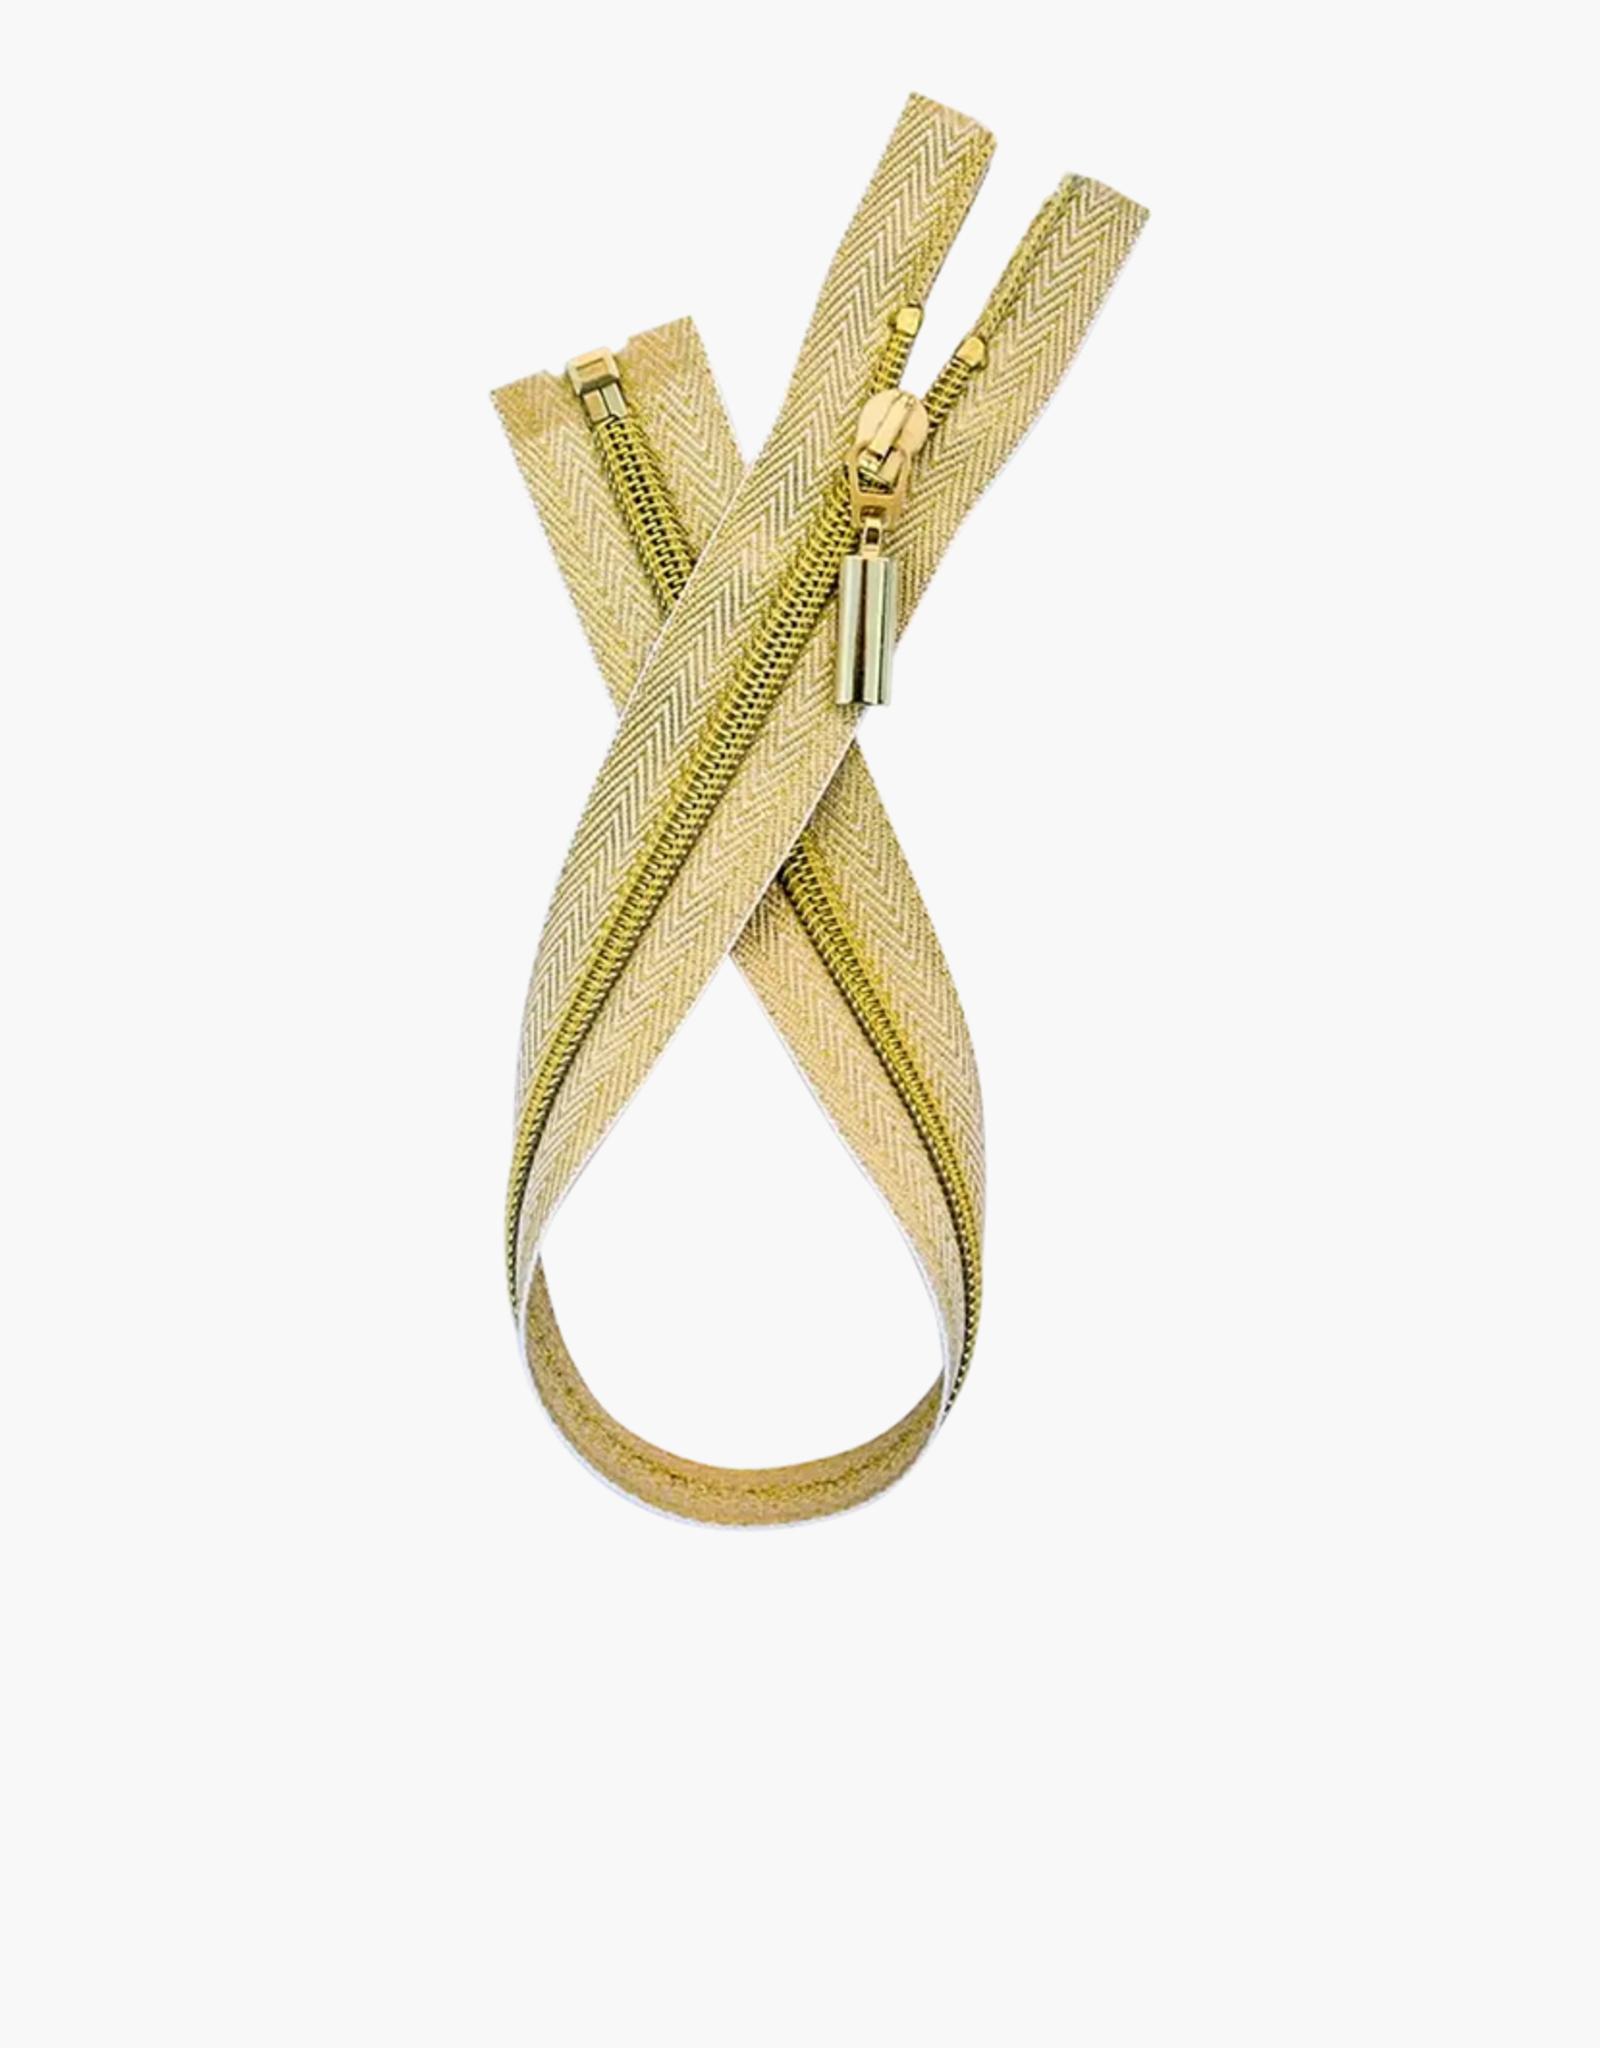 Metalen Deelbare Rits - Gold - 50cm